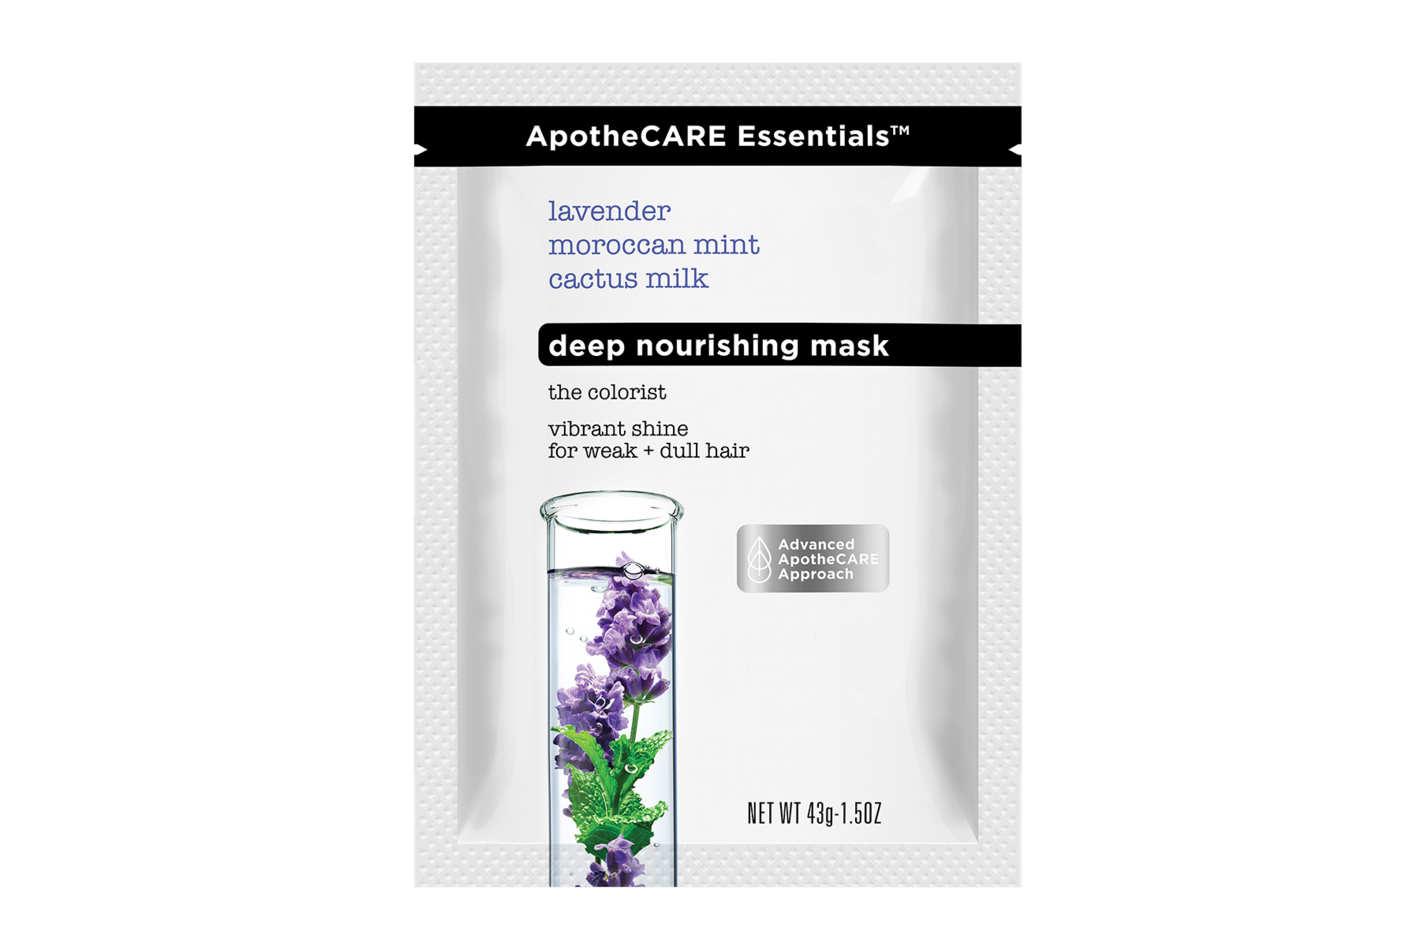 ApotheCARE Essentials The Colorist Lavender Moroccan Mint Cactus Milk Hair Mask